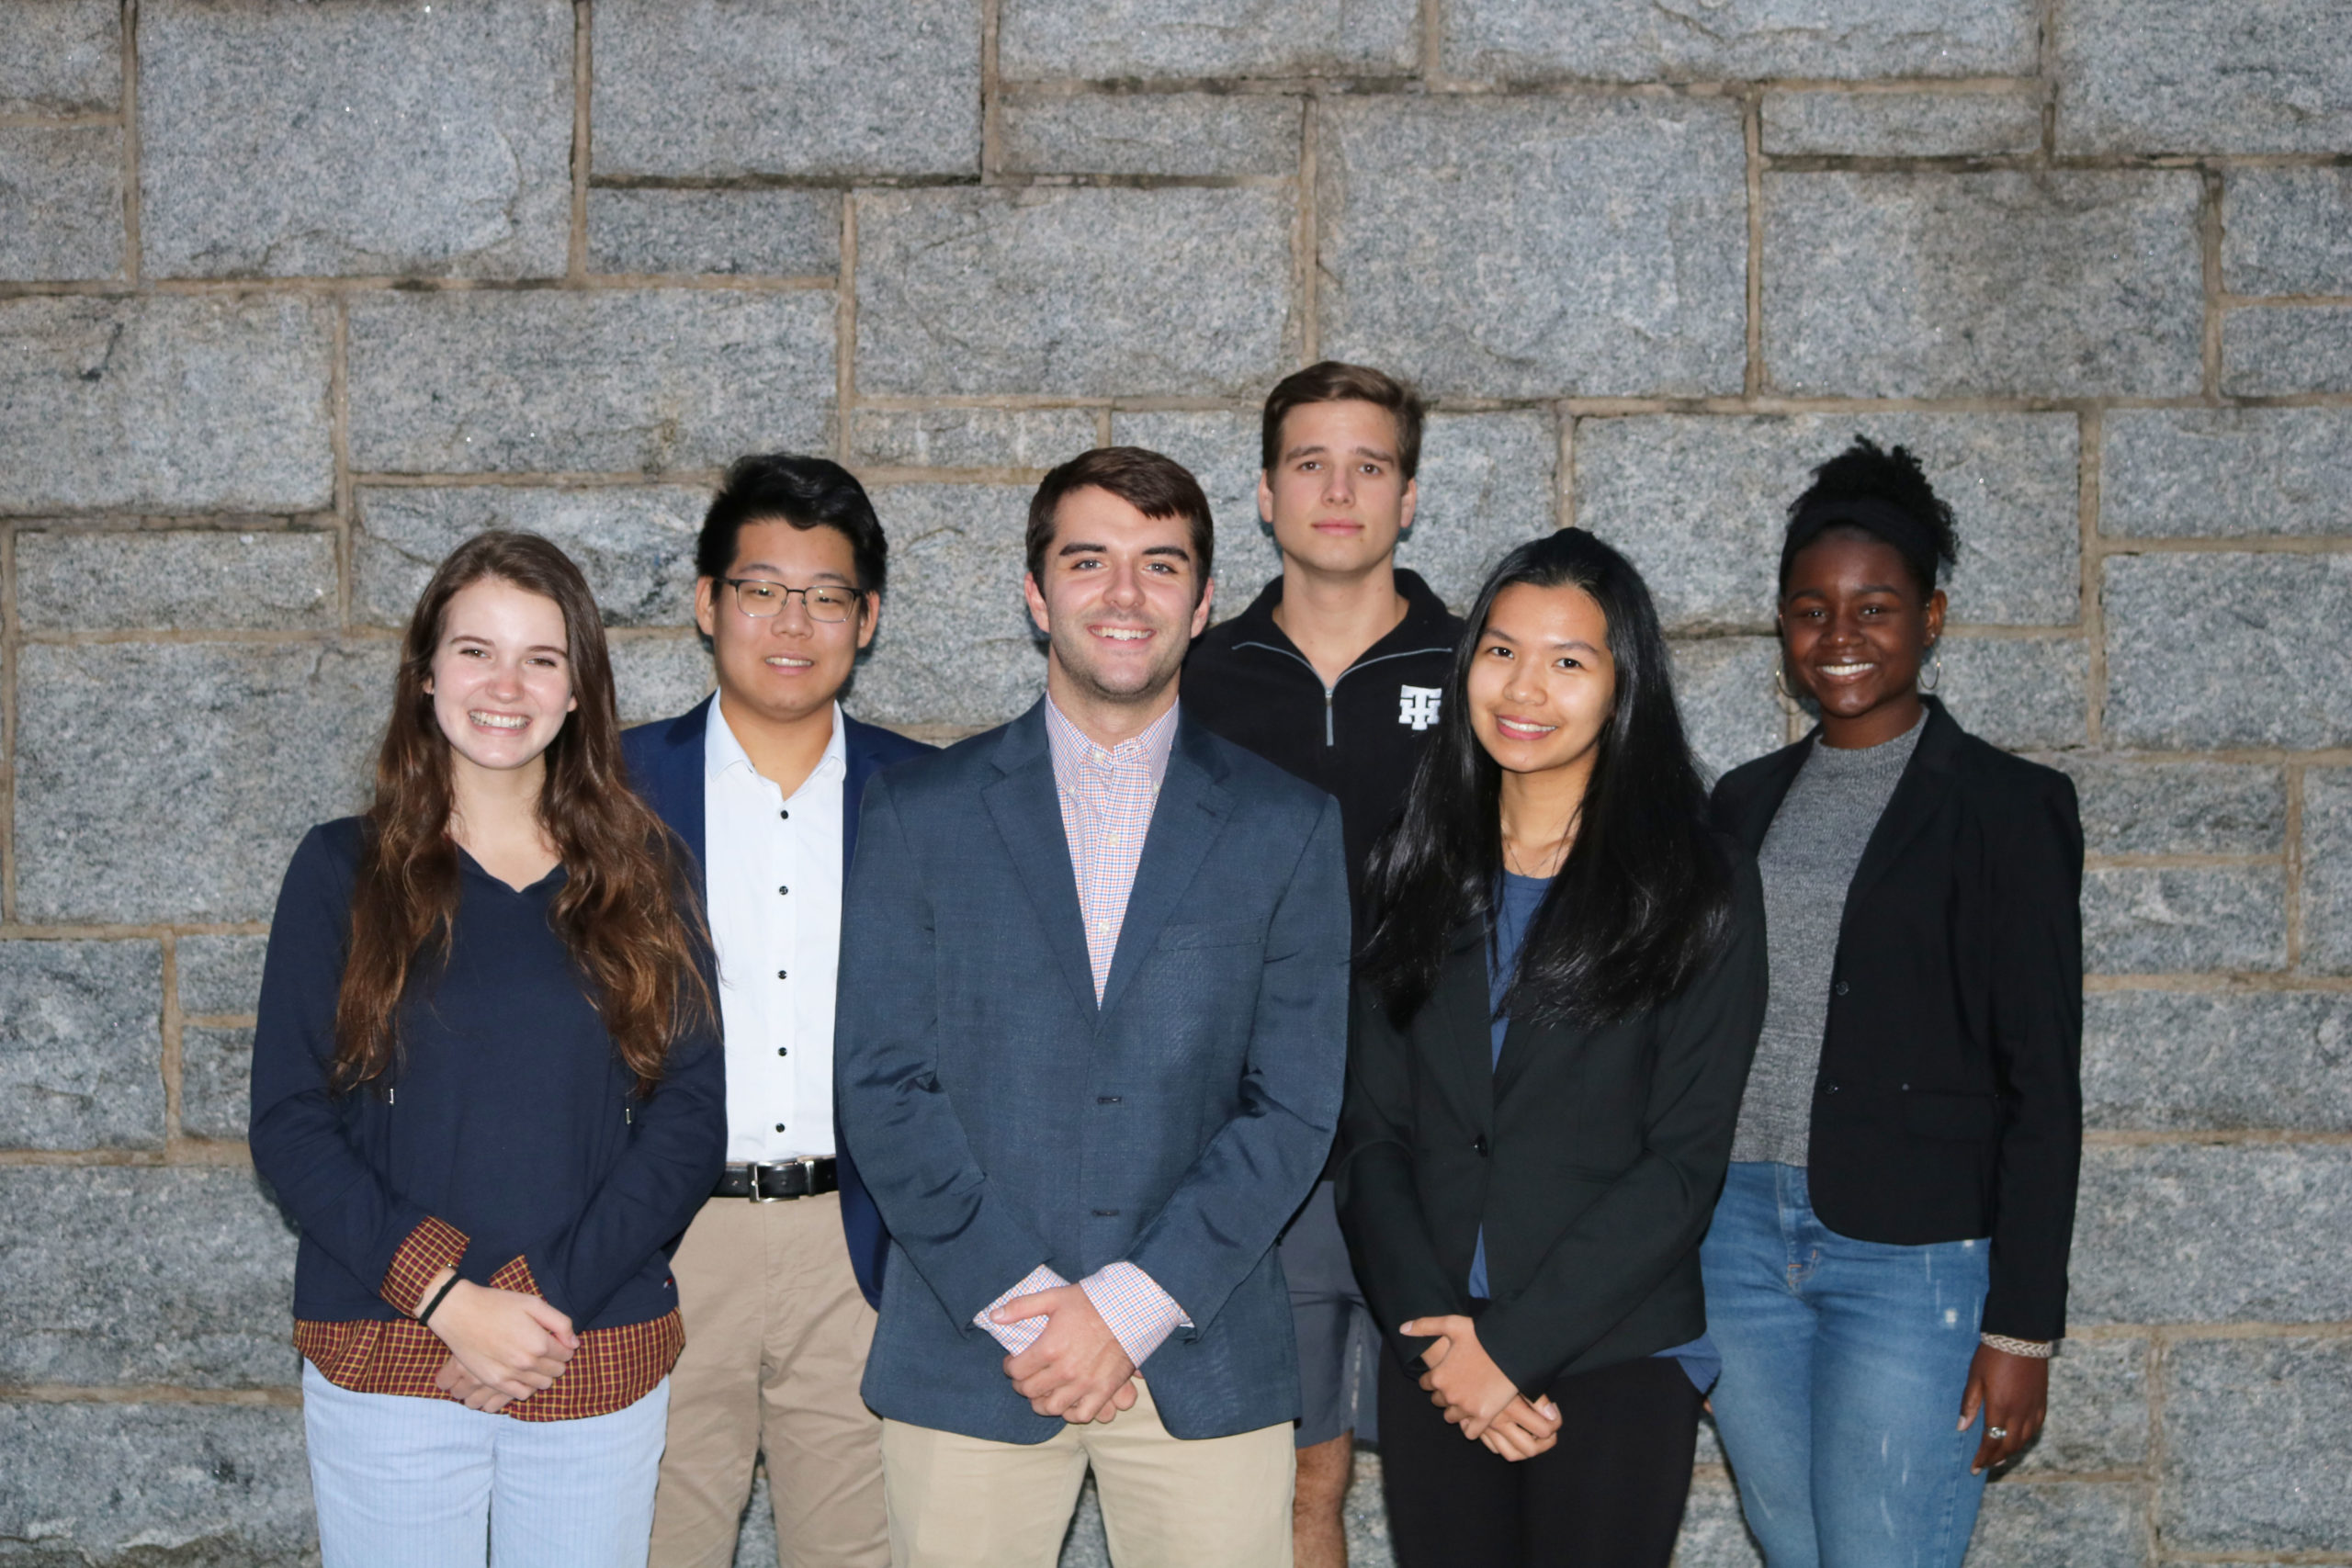 Student Organizations Council (SOC)